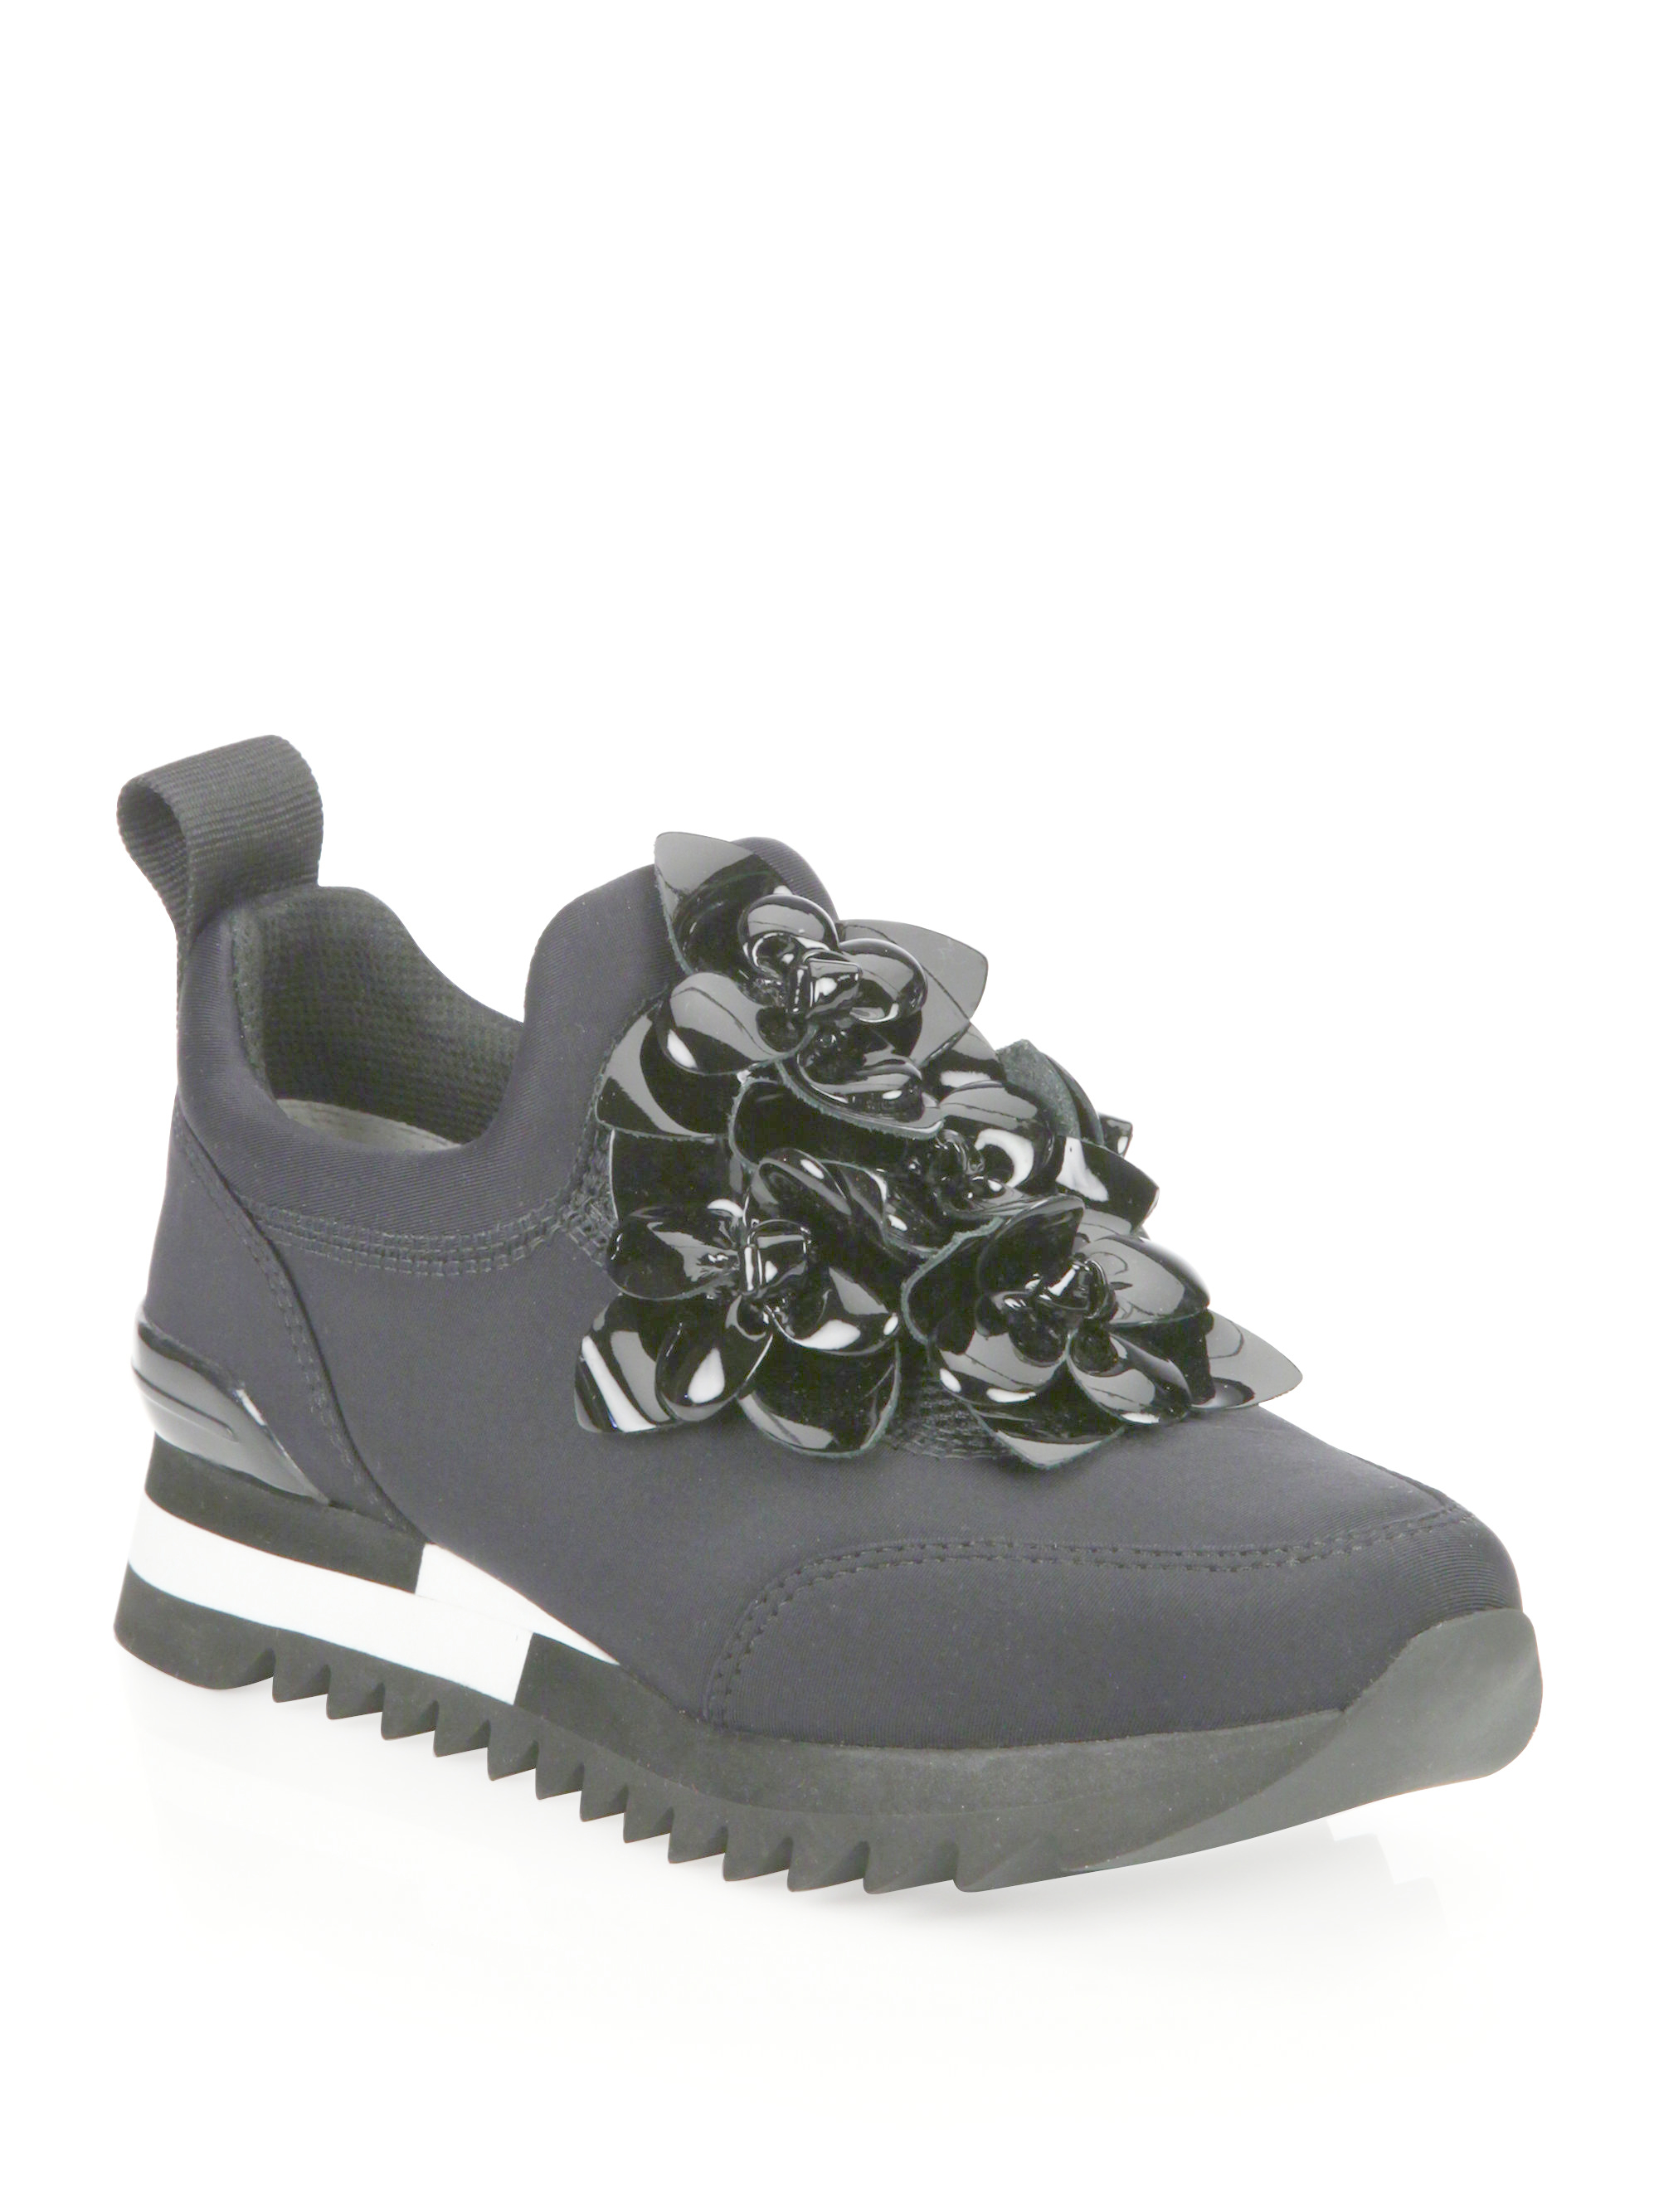 27a82fa7ff1e7 Lyst - Tory Burch Blossom Neoprene Sneakers in Black